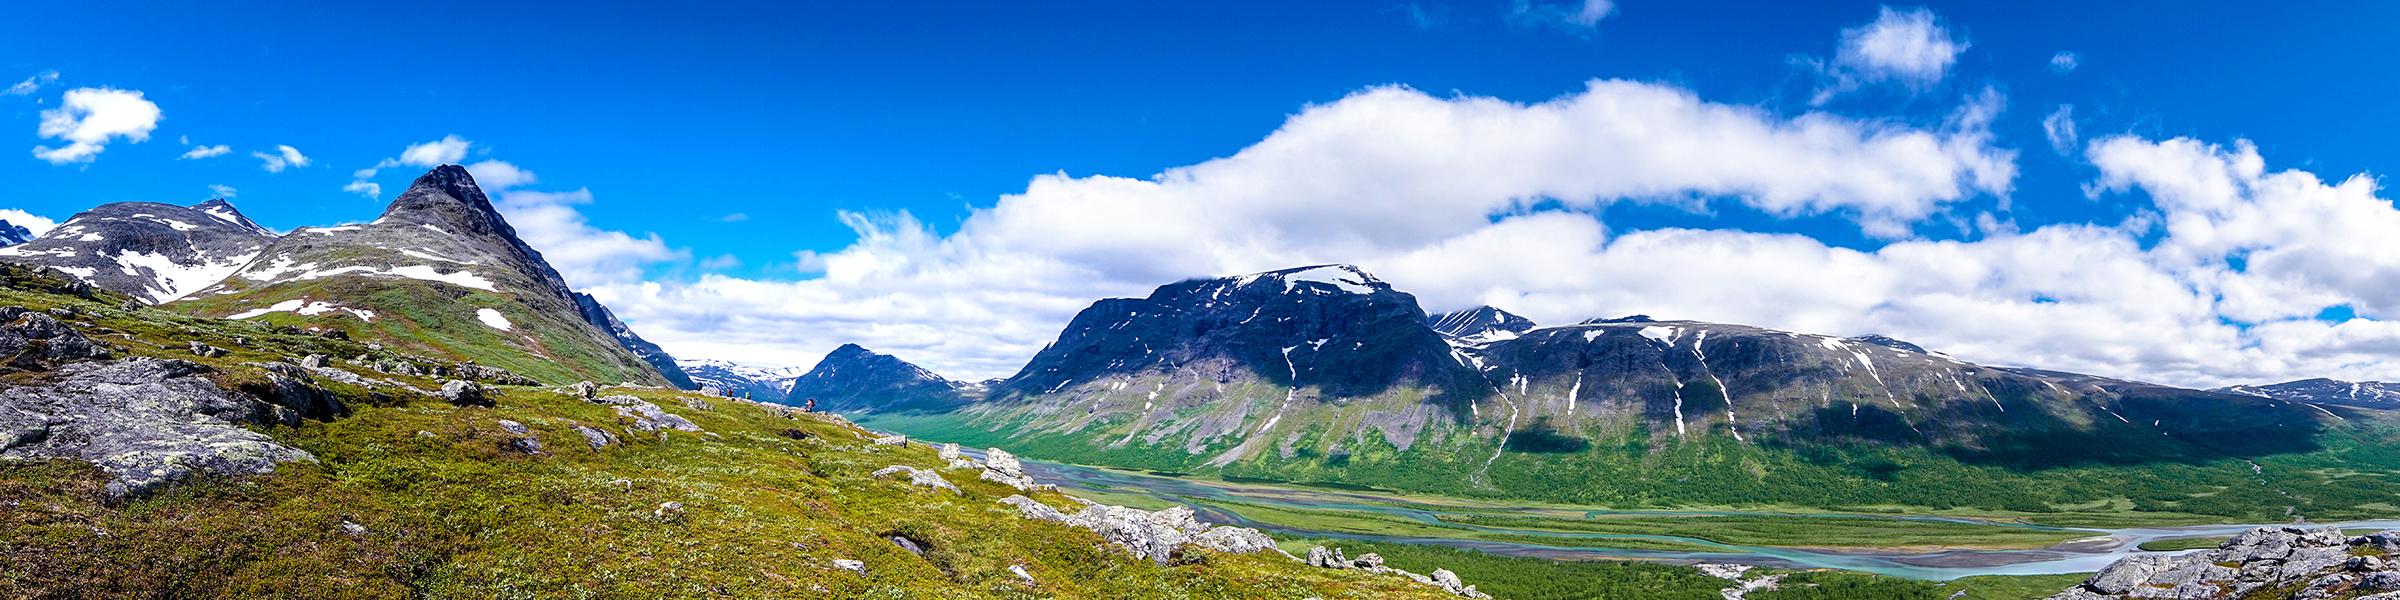 Sweden Sarek National Park